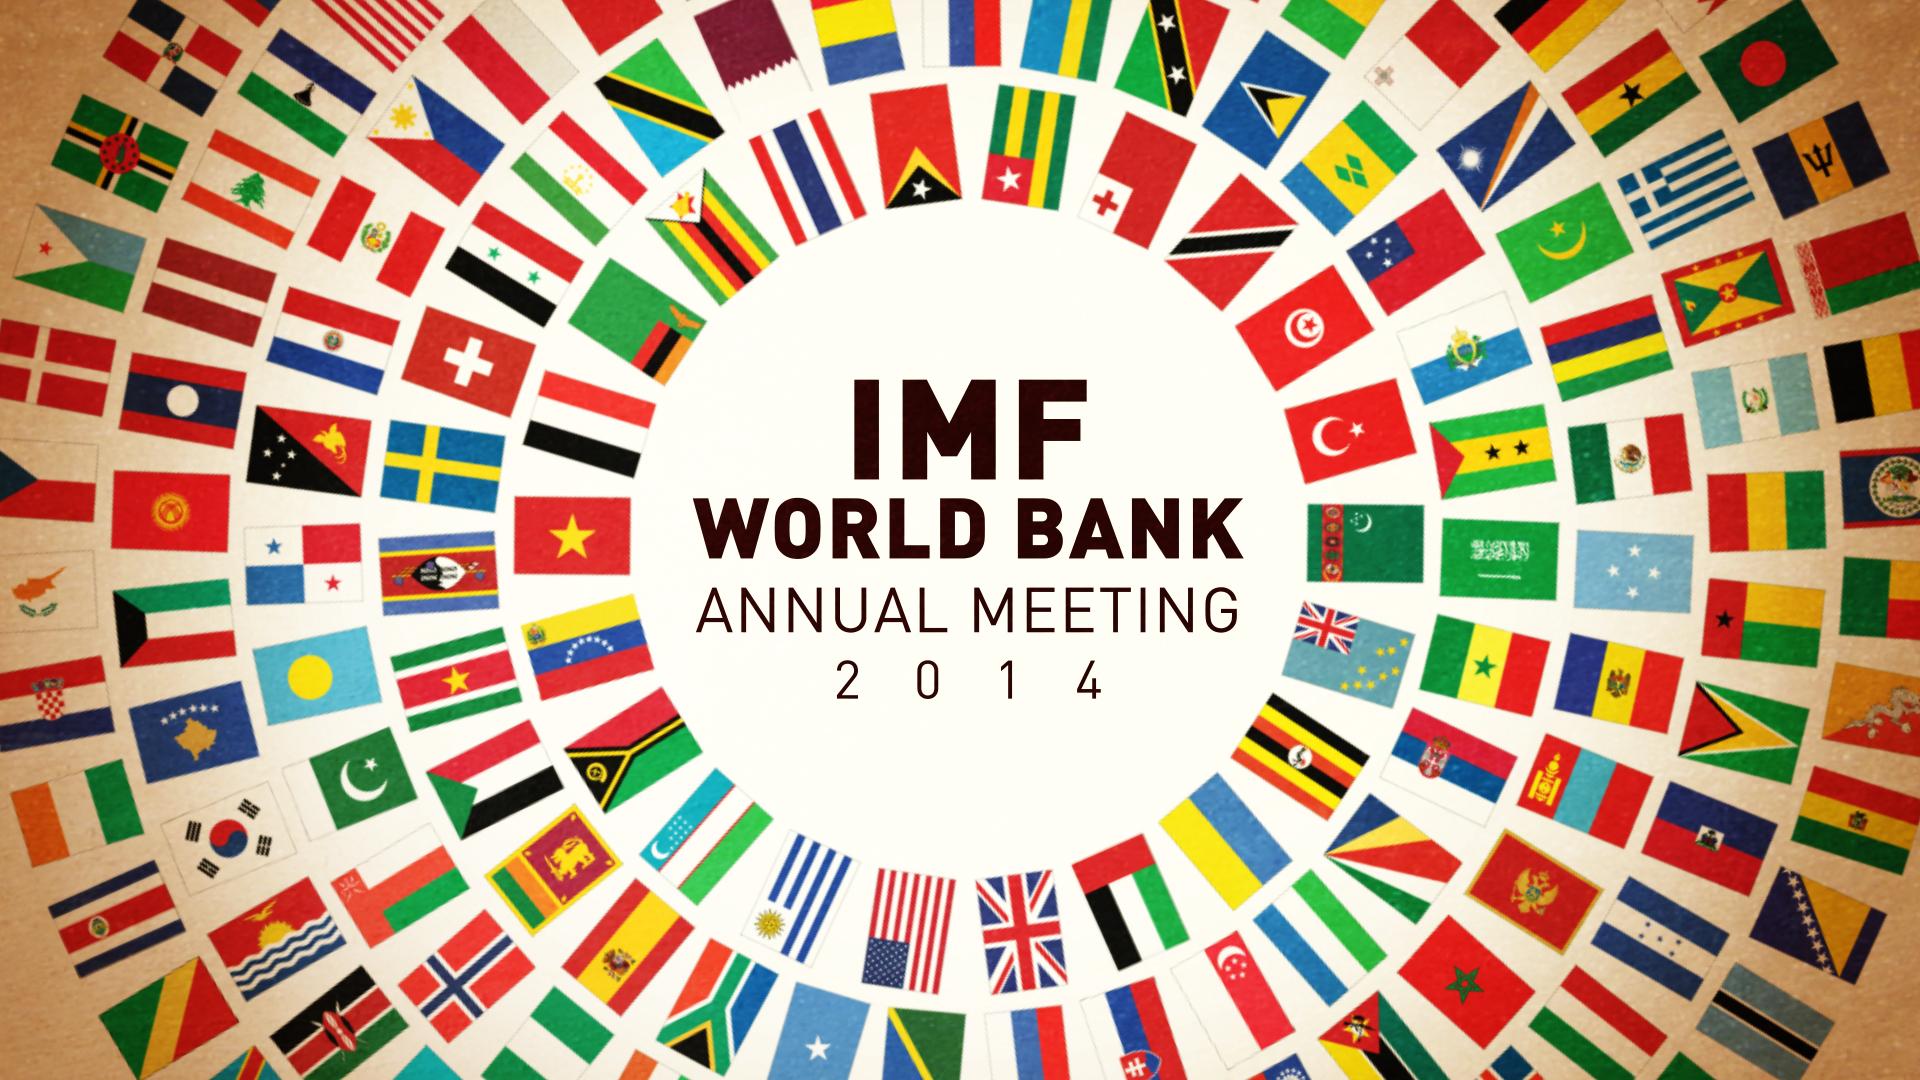 2014 IMF World Bank Annual Meeting